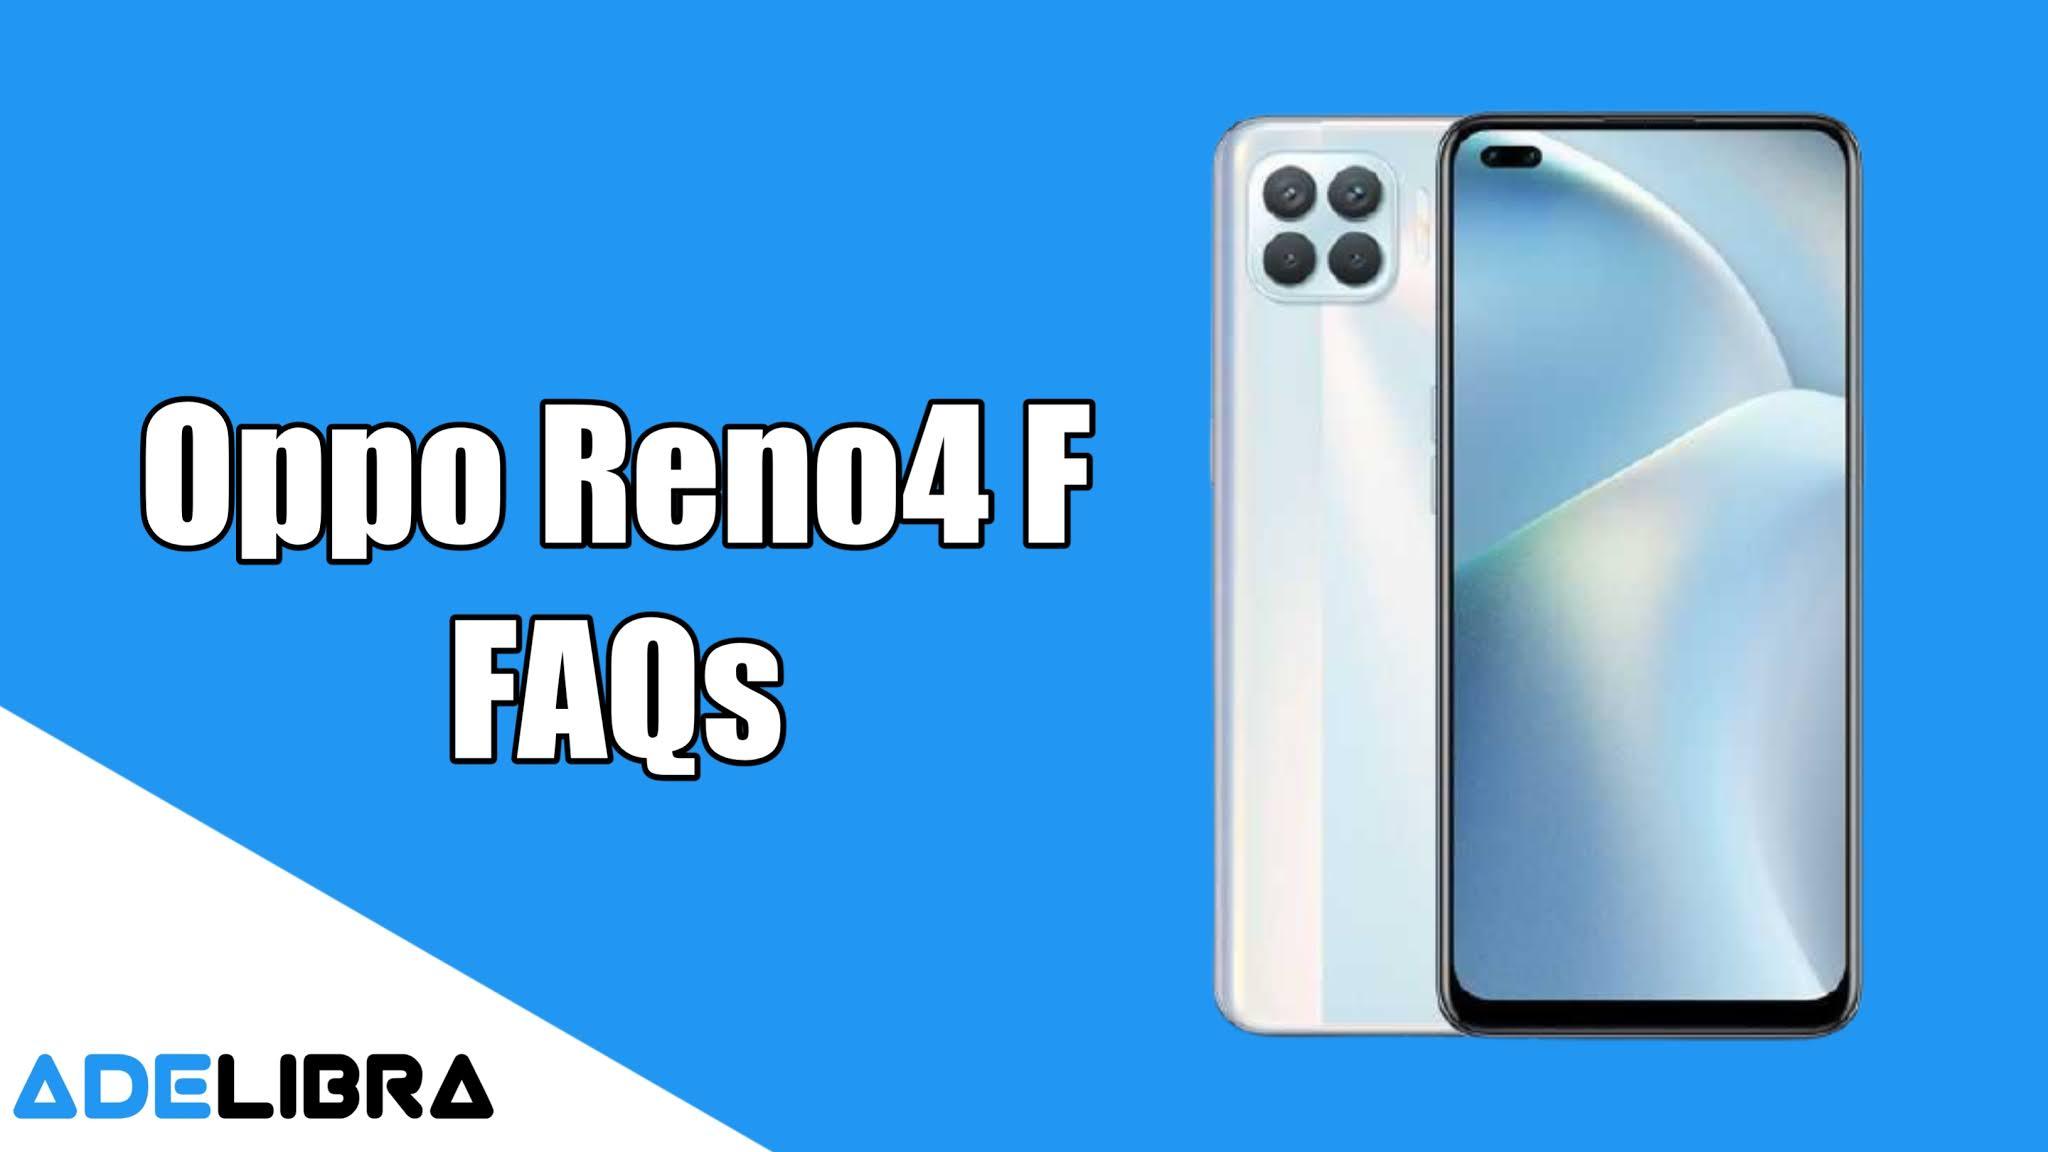 Oppo Reno4 F FAQs